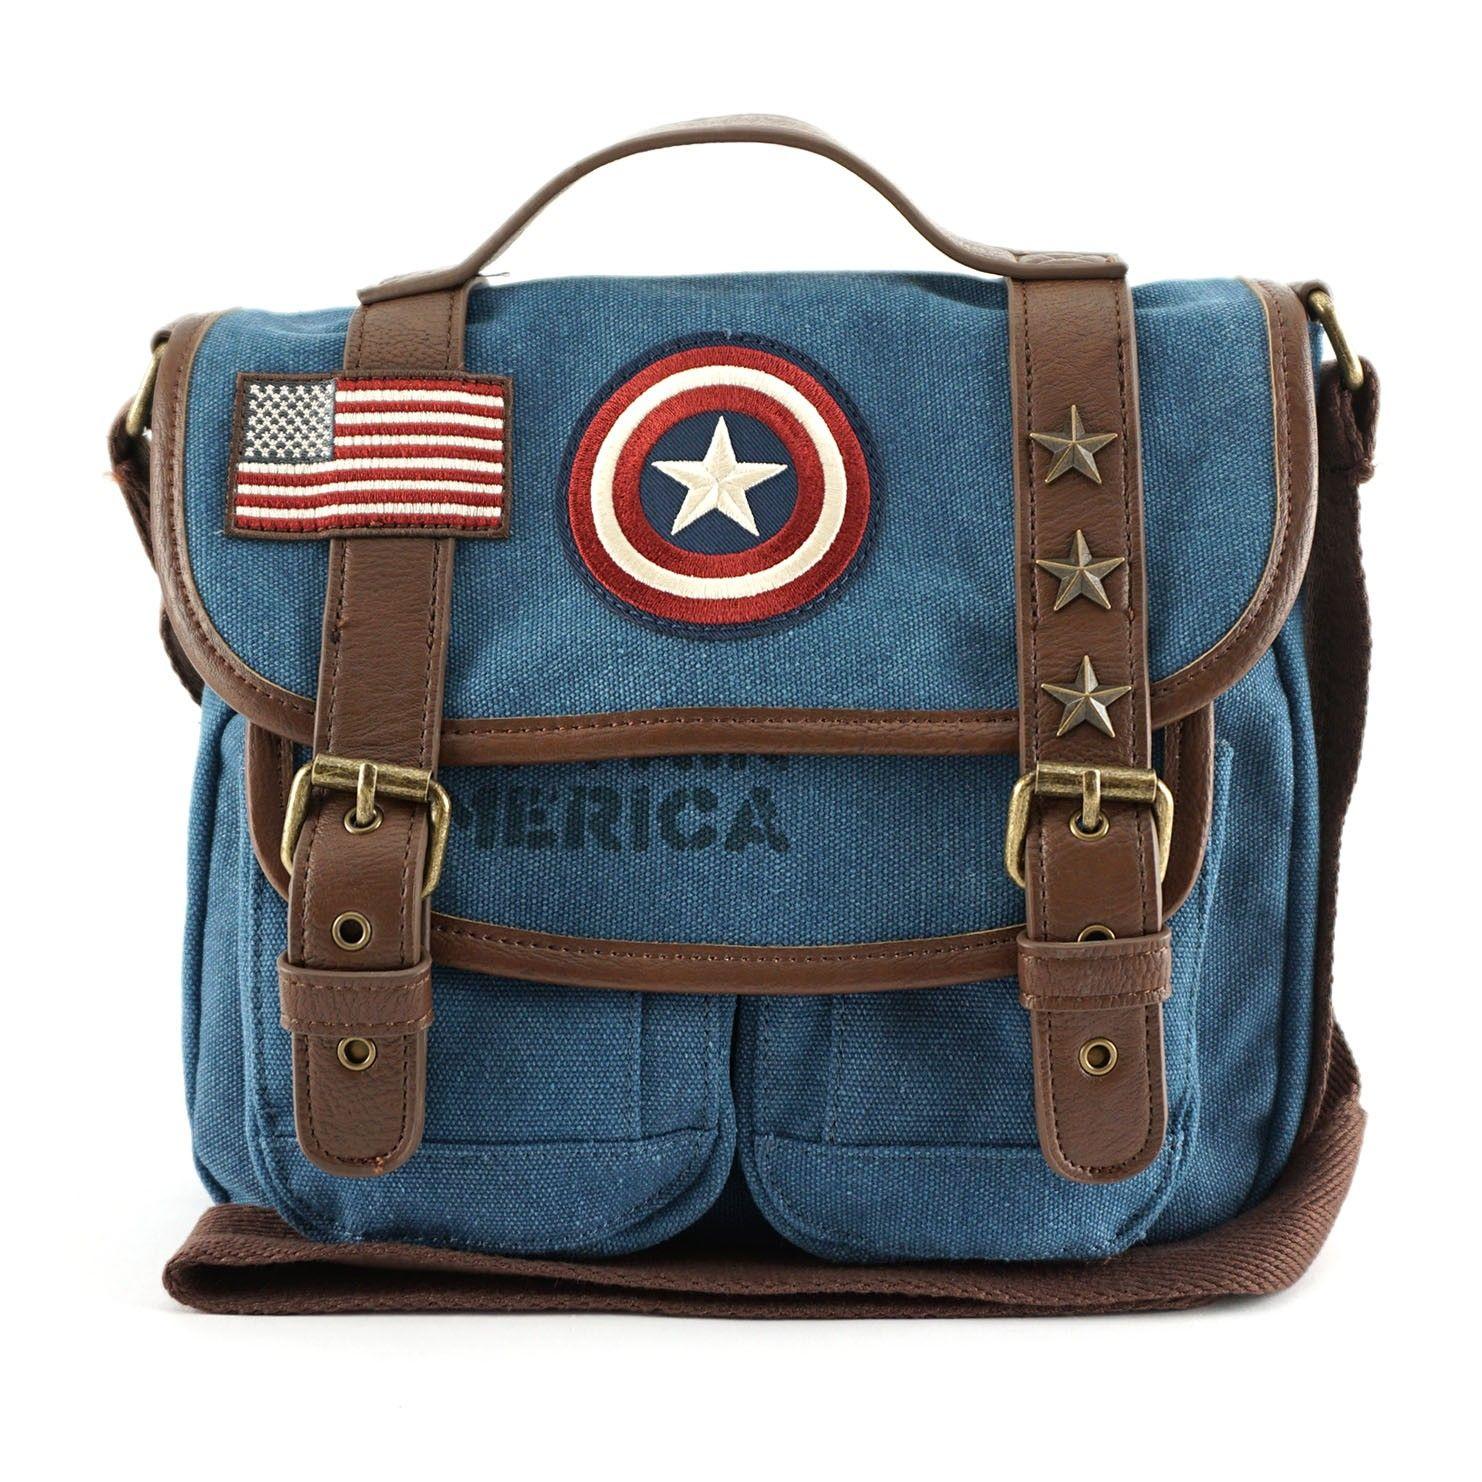 eb10ed98e45a Loungefly x Marvel Captain America Canvas Messenger Bag - Marvel - Brands